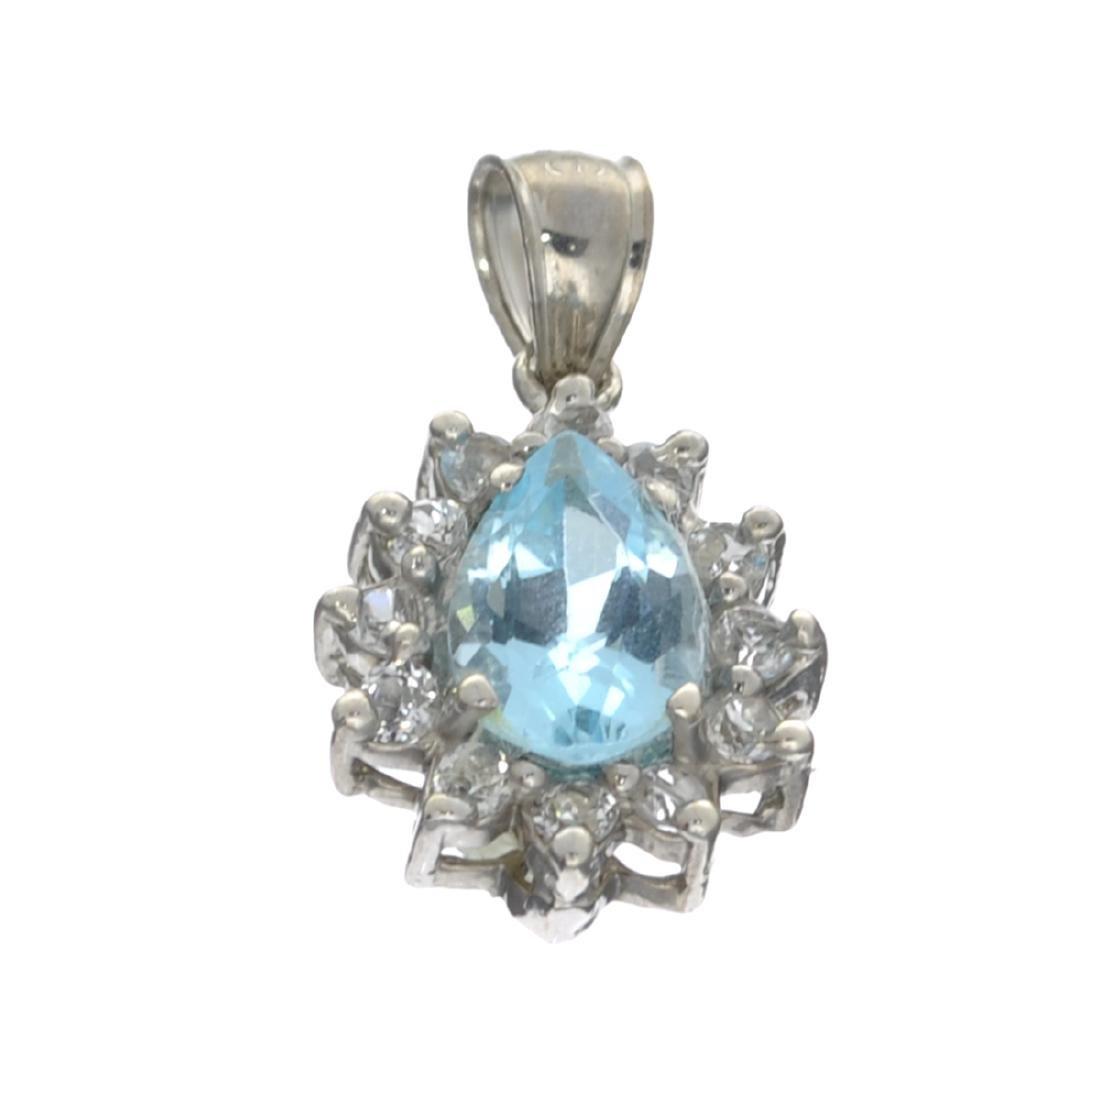 APP: 0.5k Fine Jewelry Designer Sebastian, 1.97CT